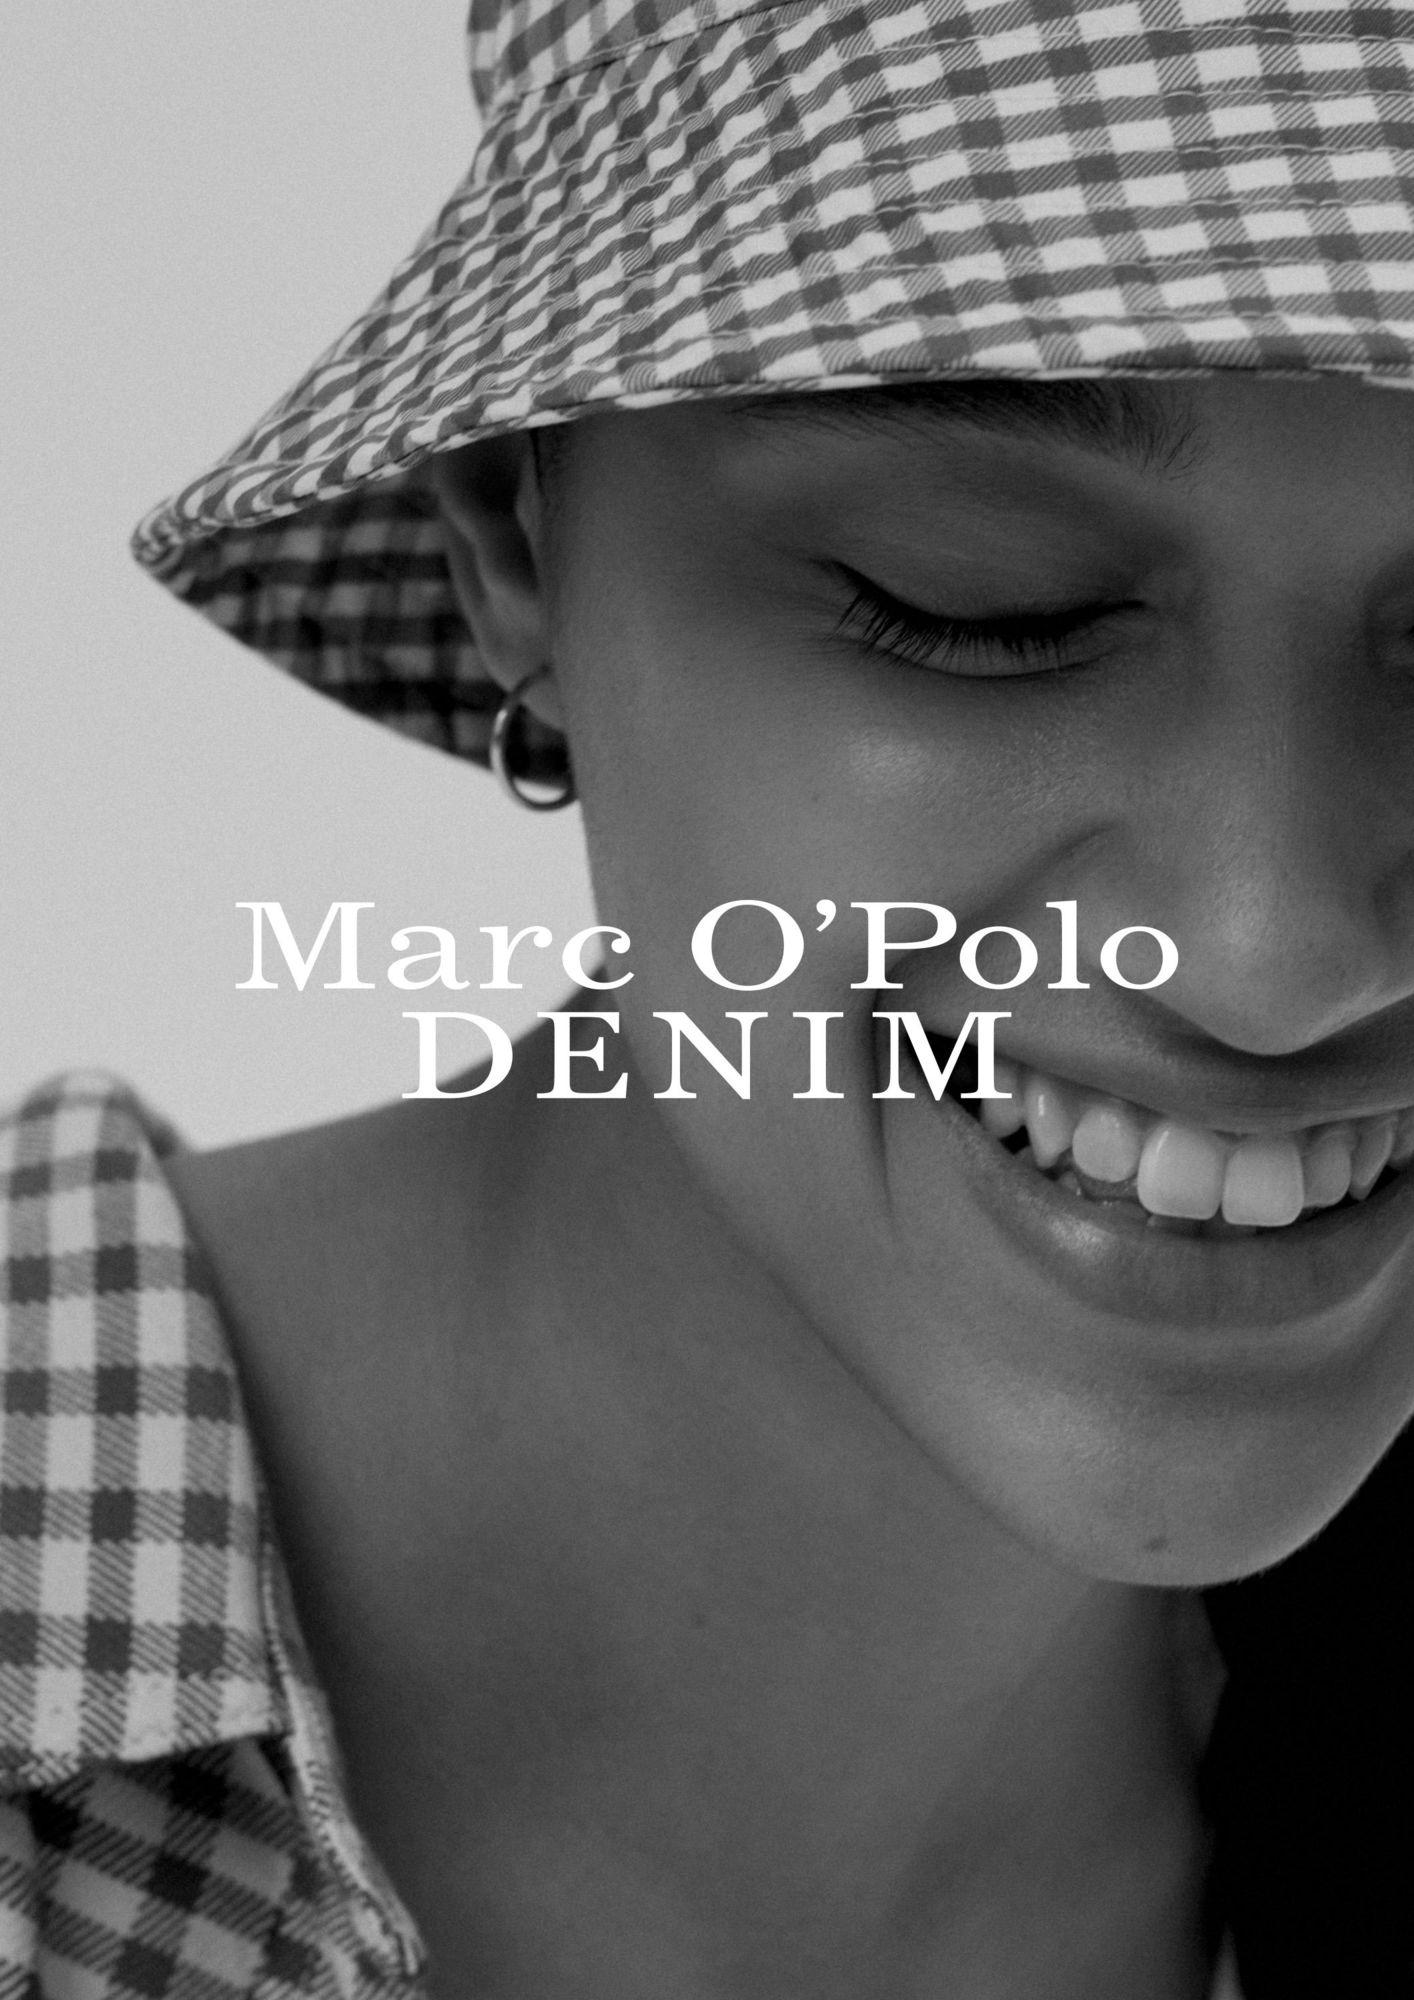 BLINK IMAGING | BILLY BALLARD | MARC O'POLO DENIM